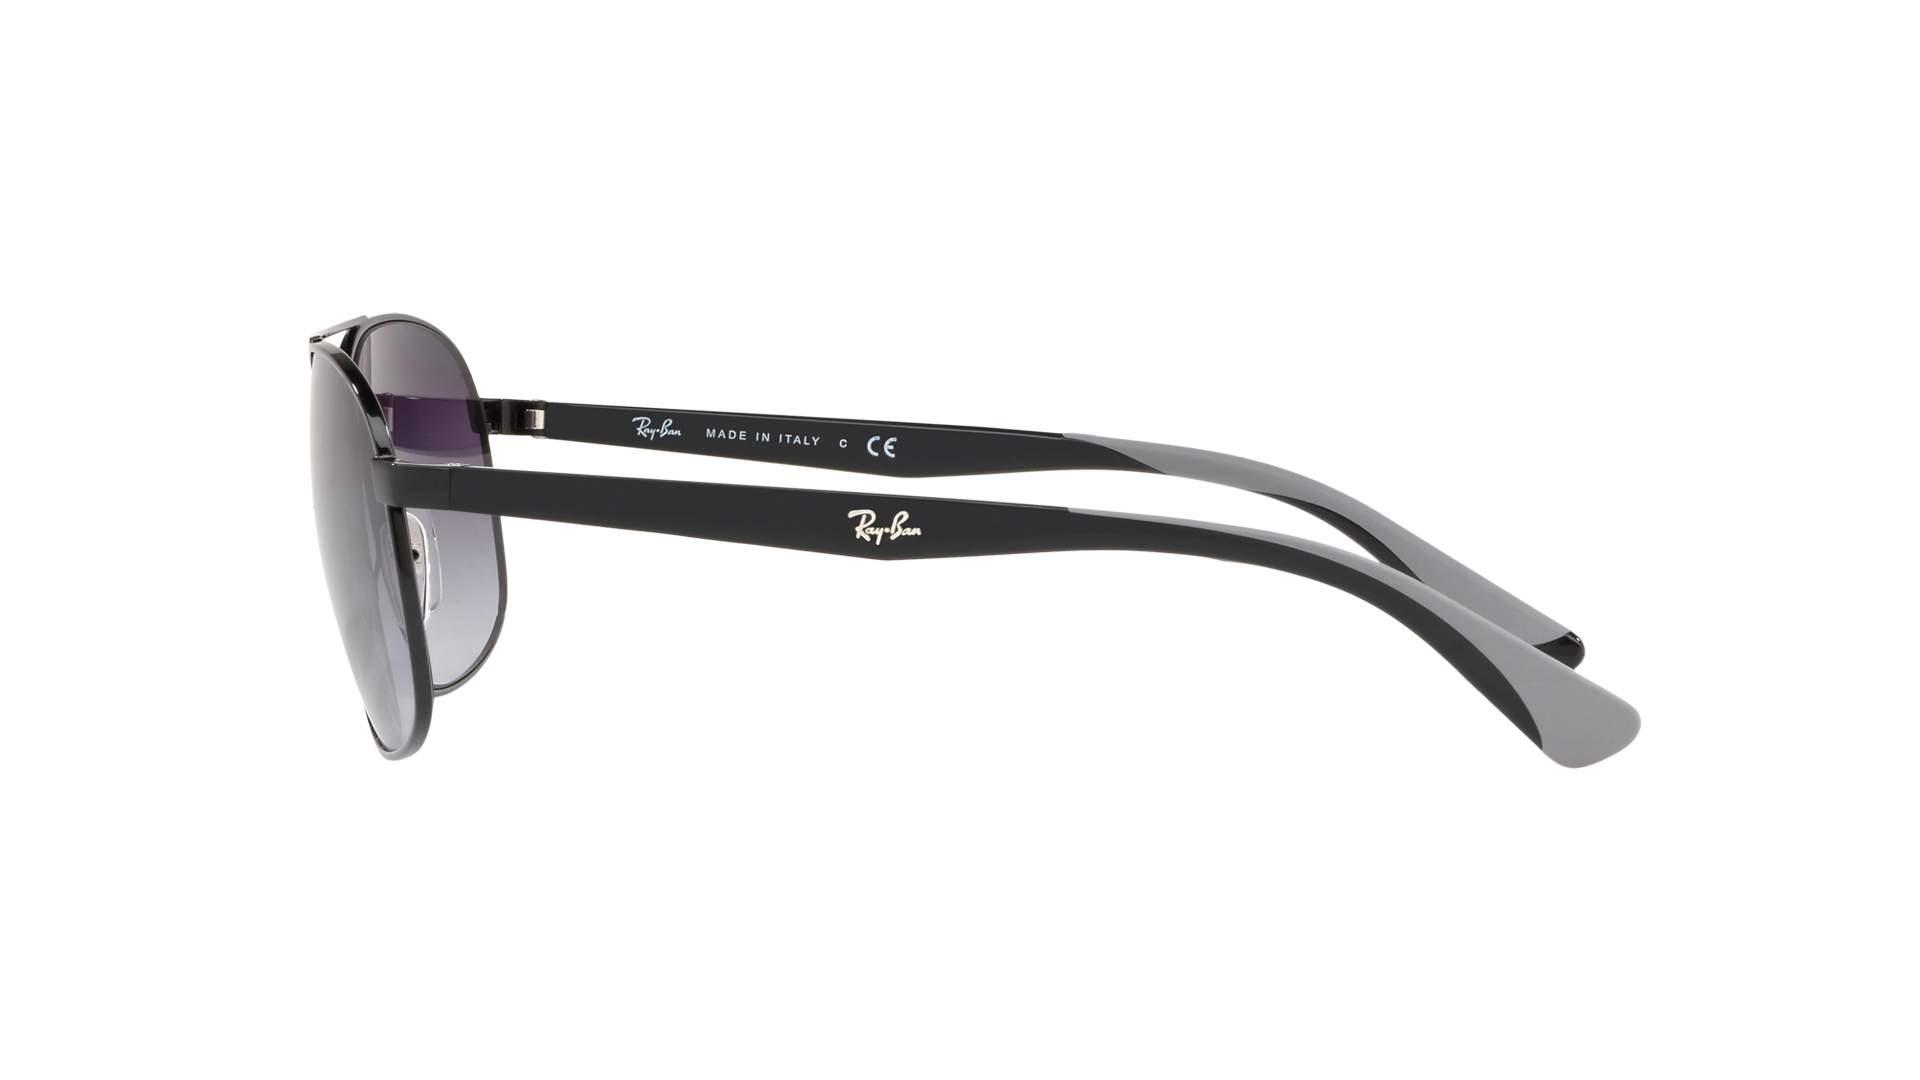 5cd8929bb1 Sunglasses Ray-Ban RB3593 002 8G 58-17 Black Medium Gradient